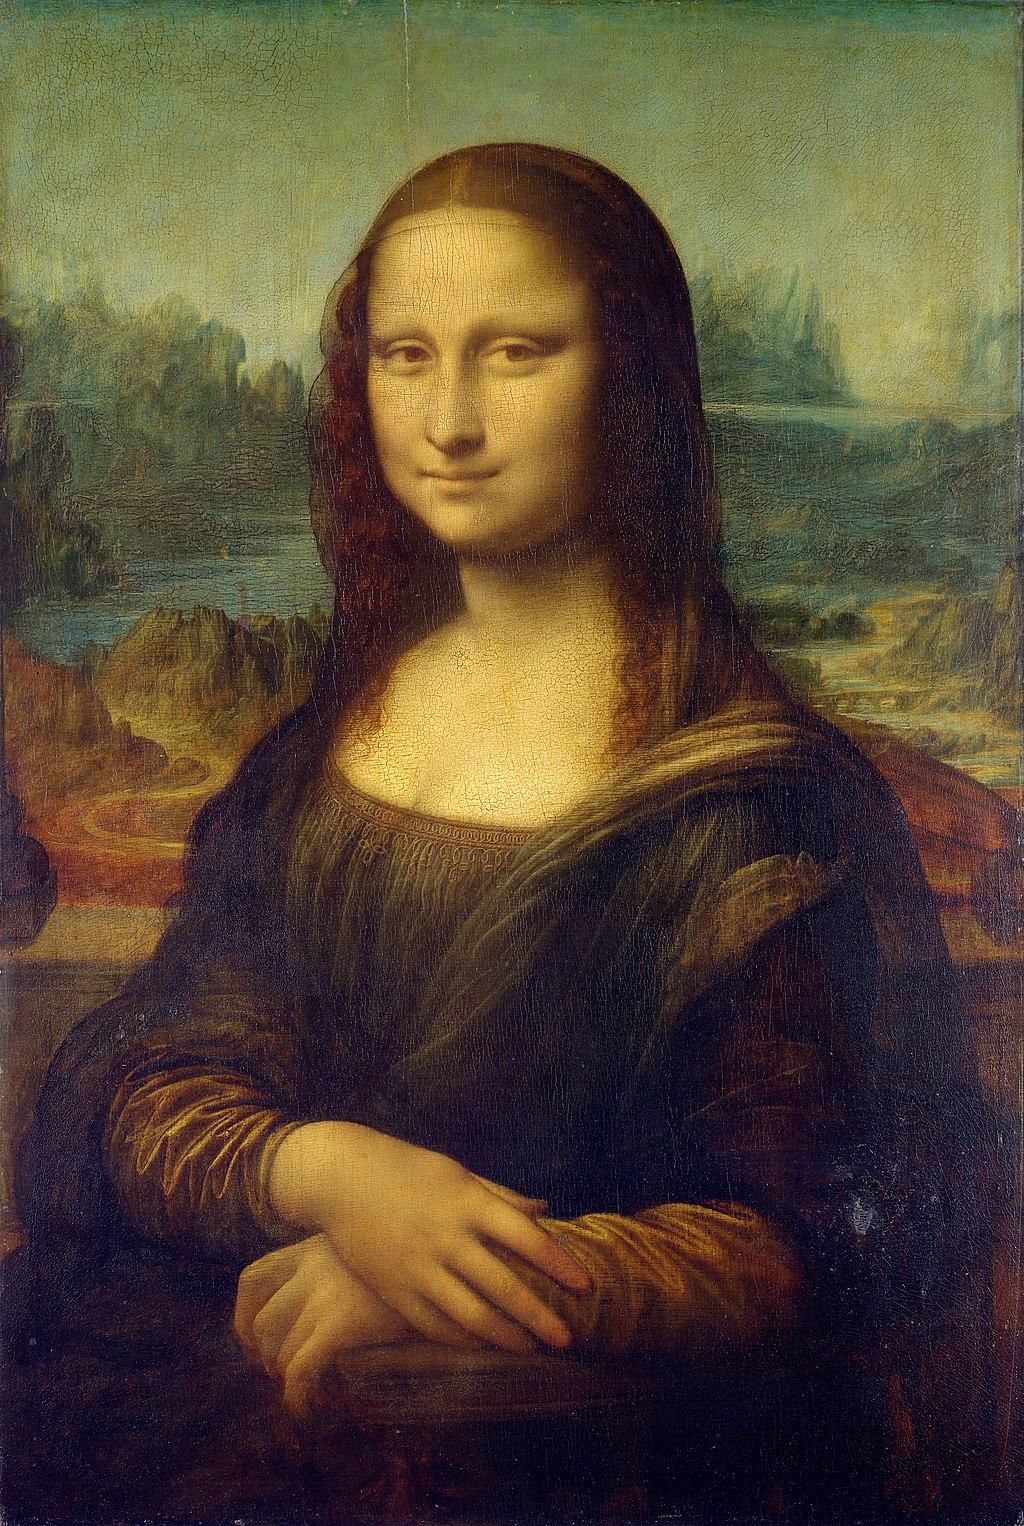 1024px-Mona_Lisa,_by_Leonardo_da_Vinci,_from_C2RMF_retouched.jpg